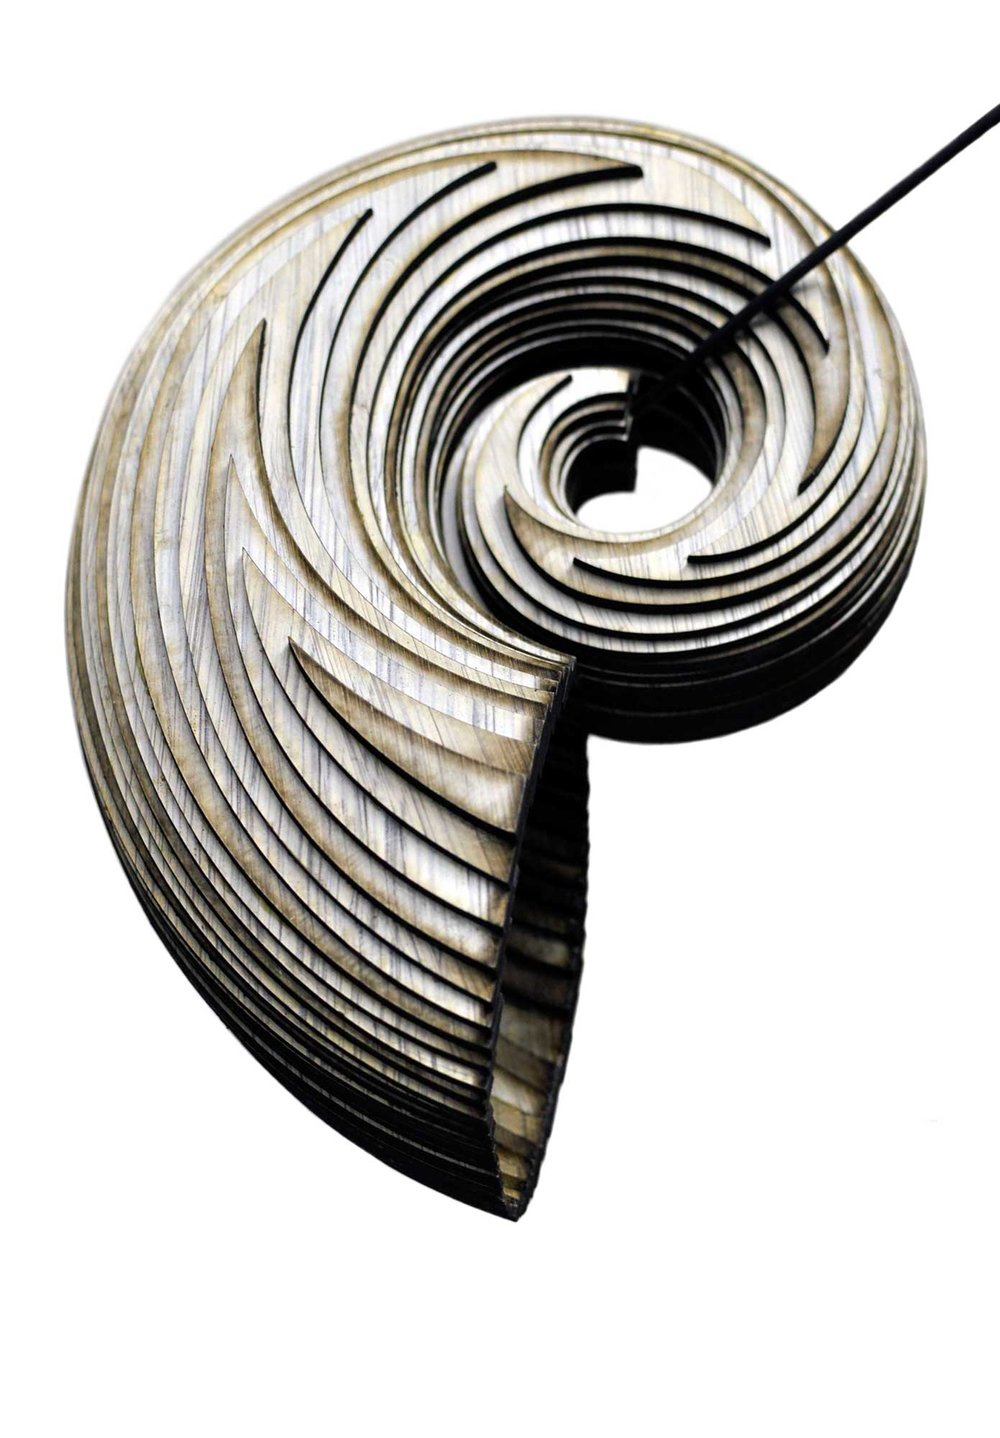 nauti.ripple.nautilus.acoustics.acoustic.spiral.seashell.soundshell.6.jpg